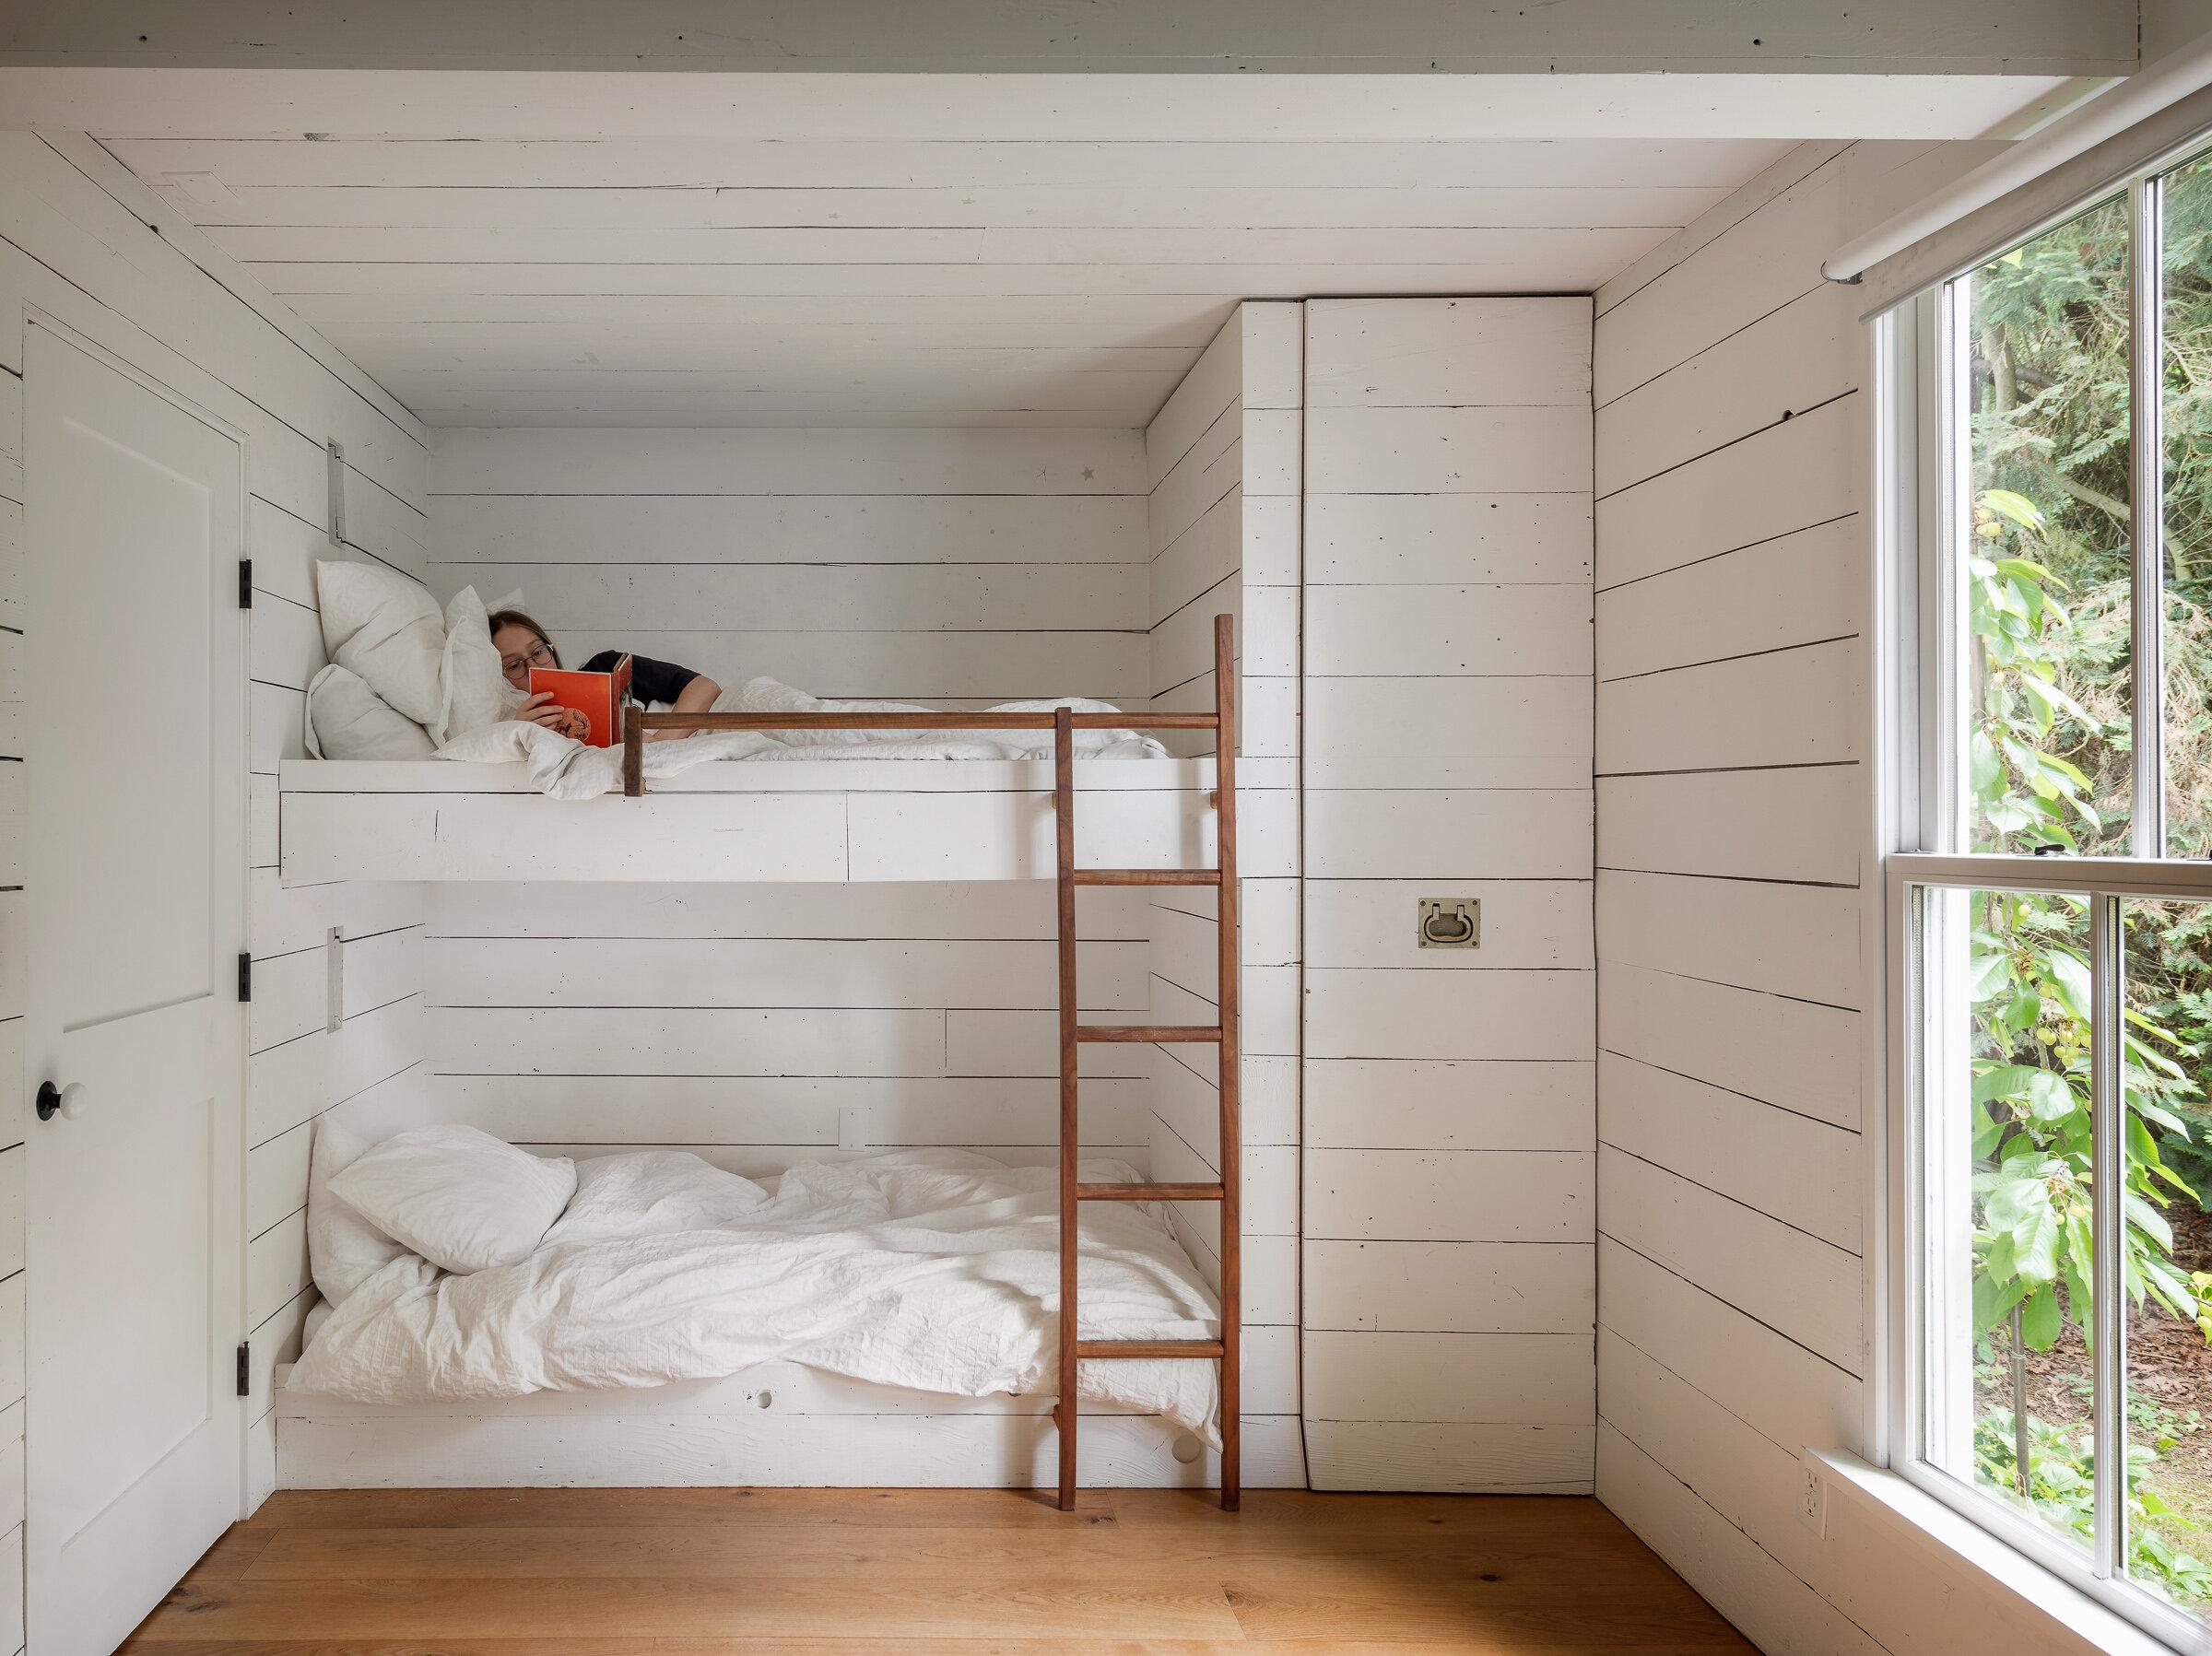 interior design companies in spain islands